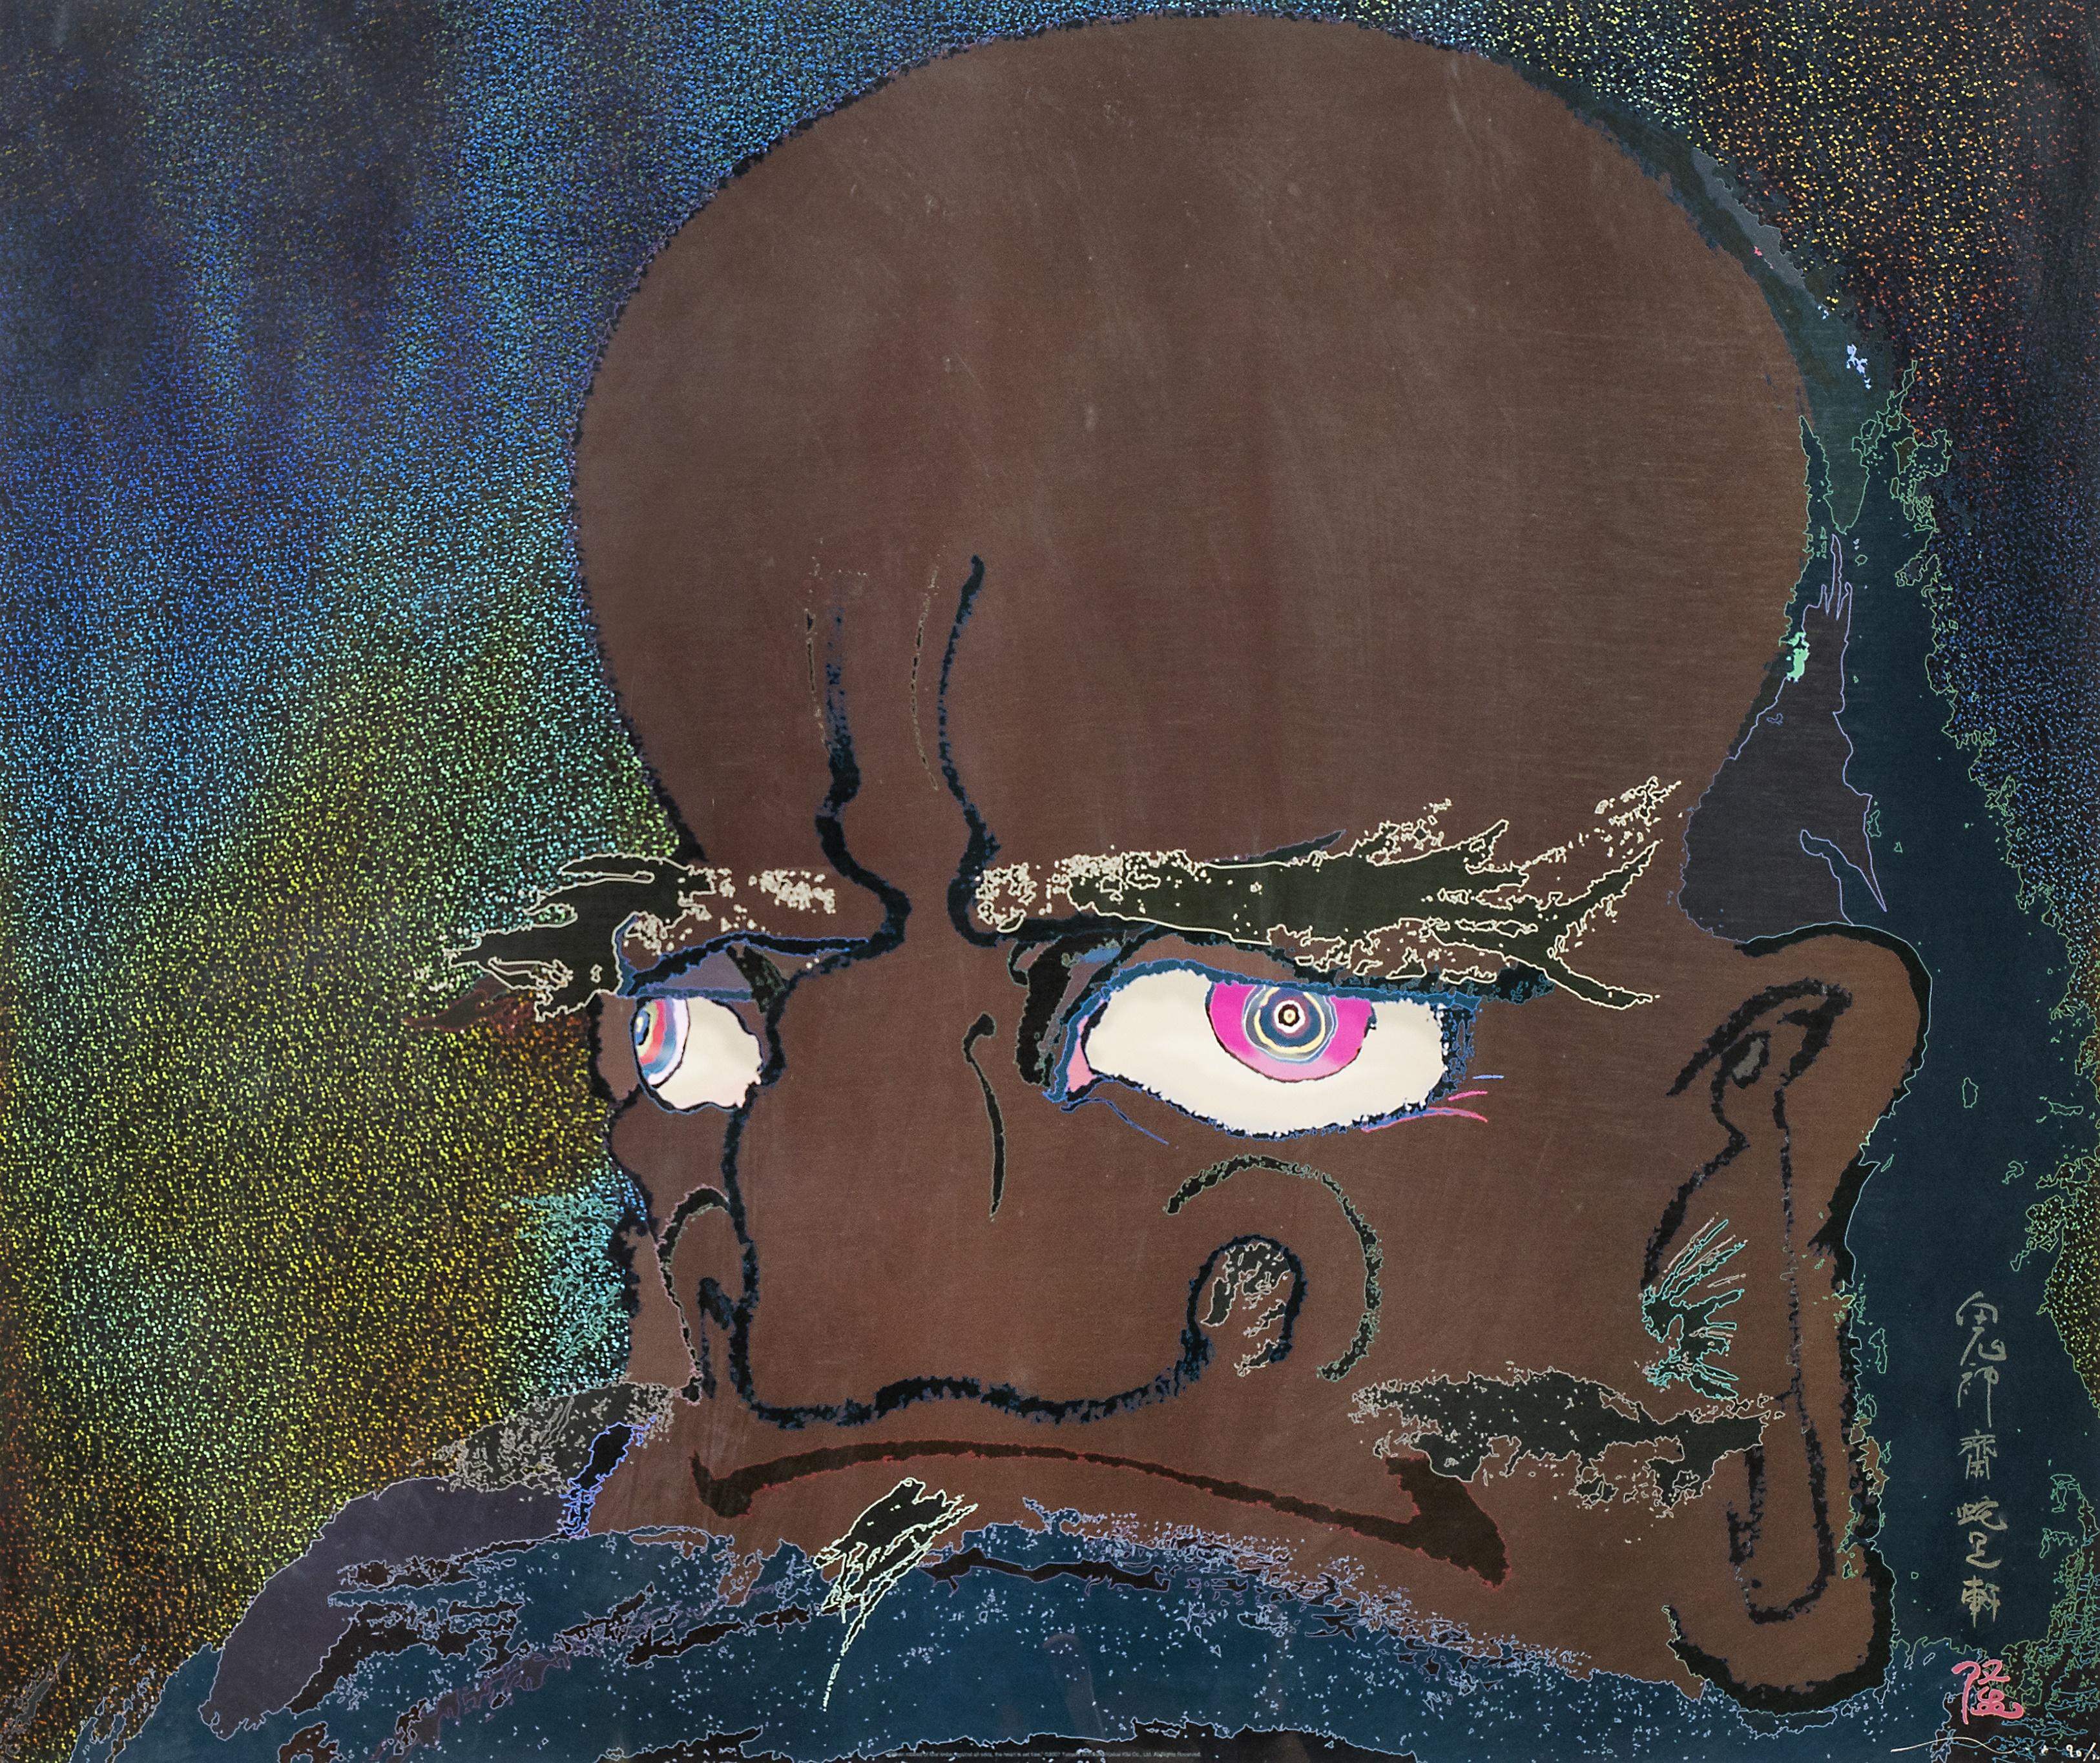 Takashi Murakami (Japan 1962-) Durama, When Robbed of our Limbs, 2007